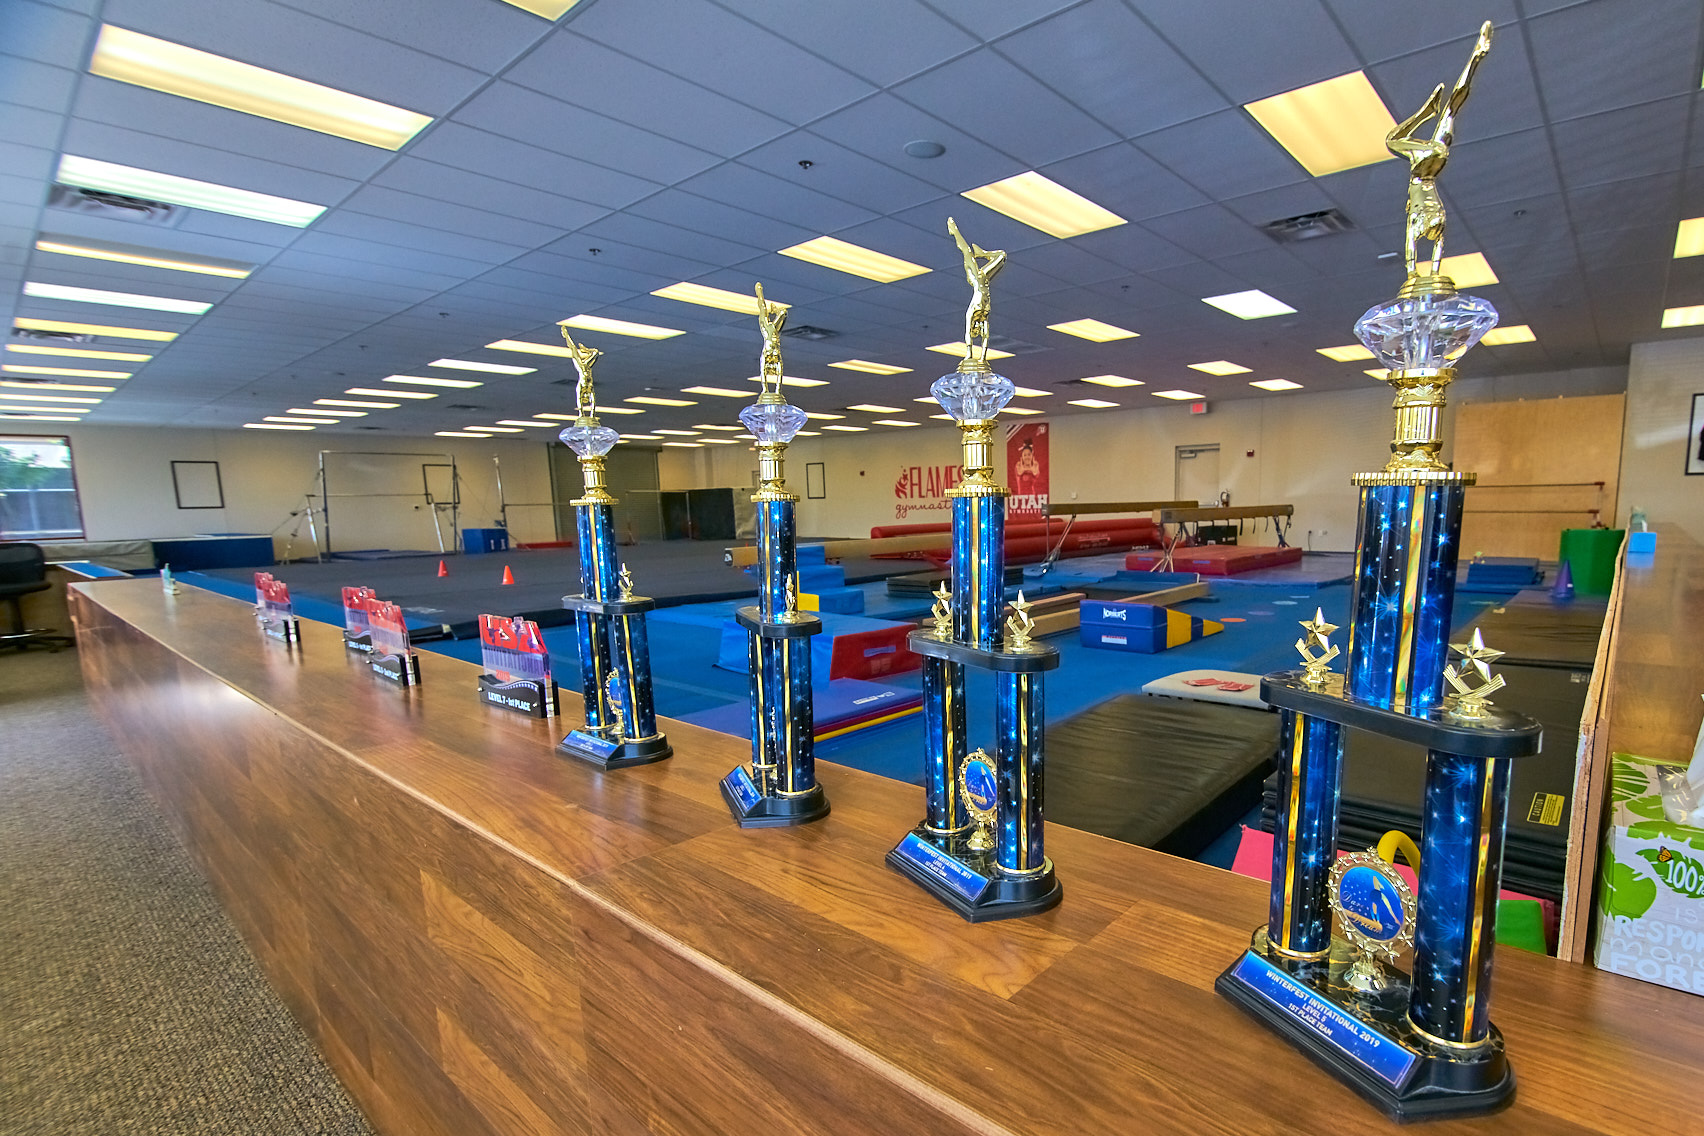 Award winning gymnastic team